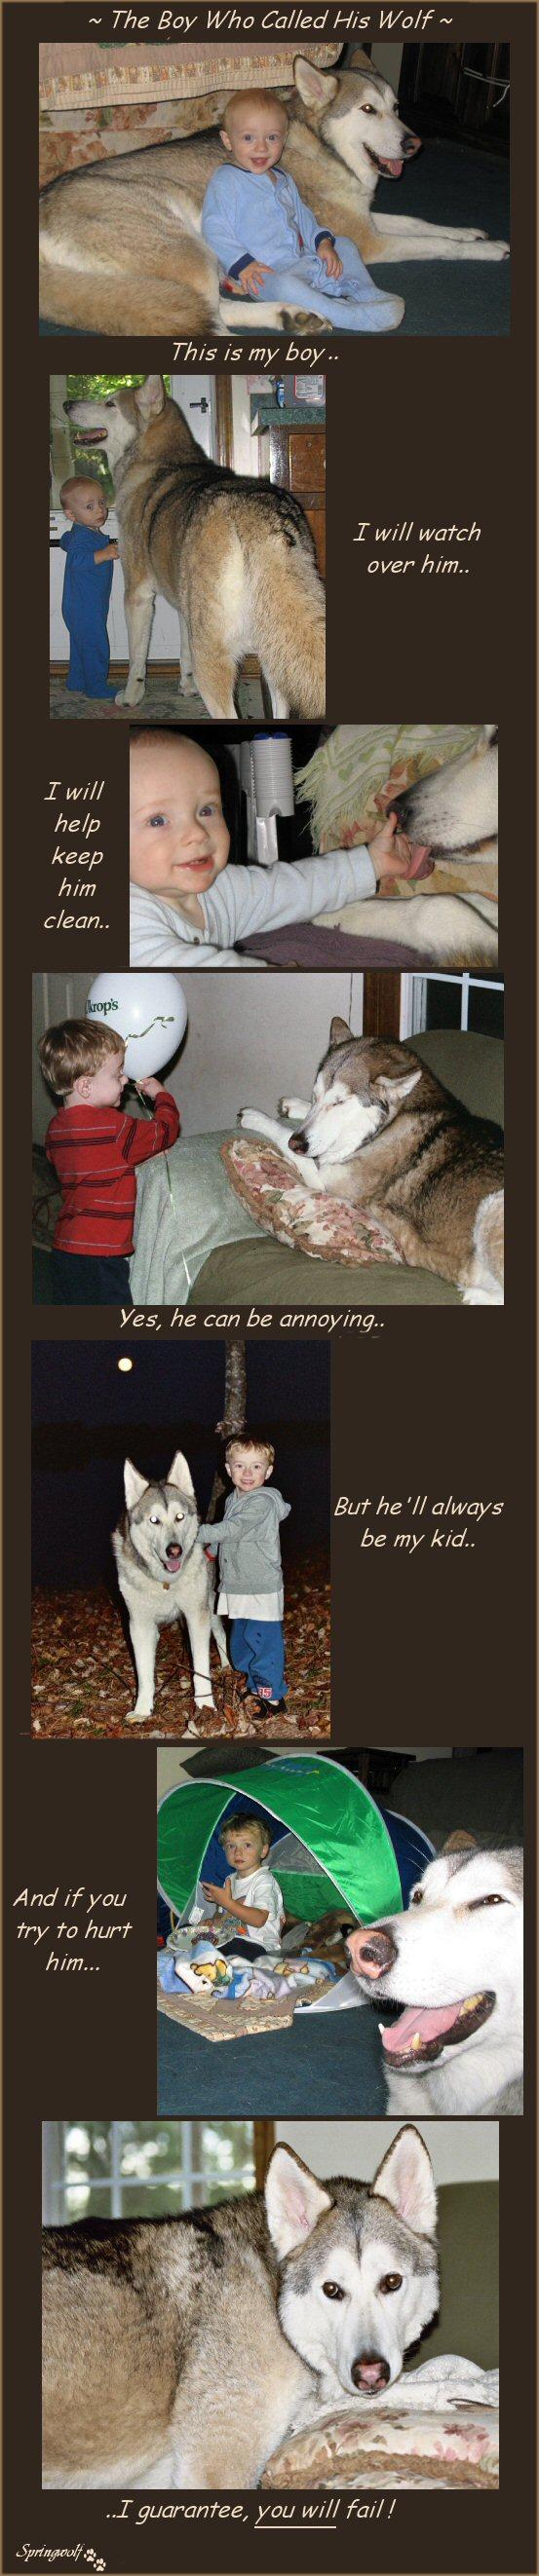 Merlin's Story